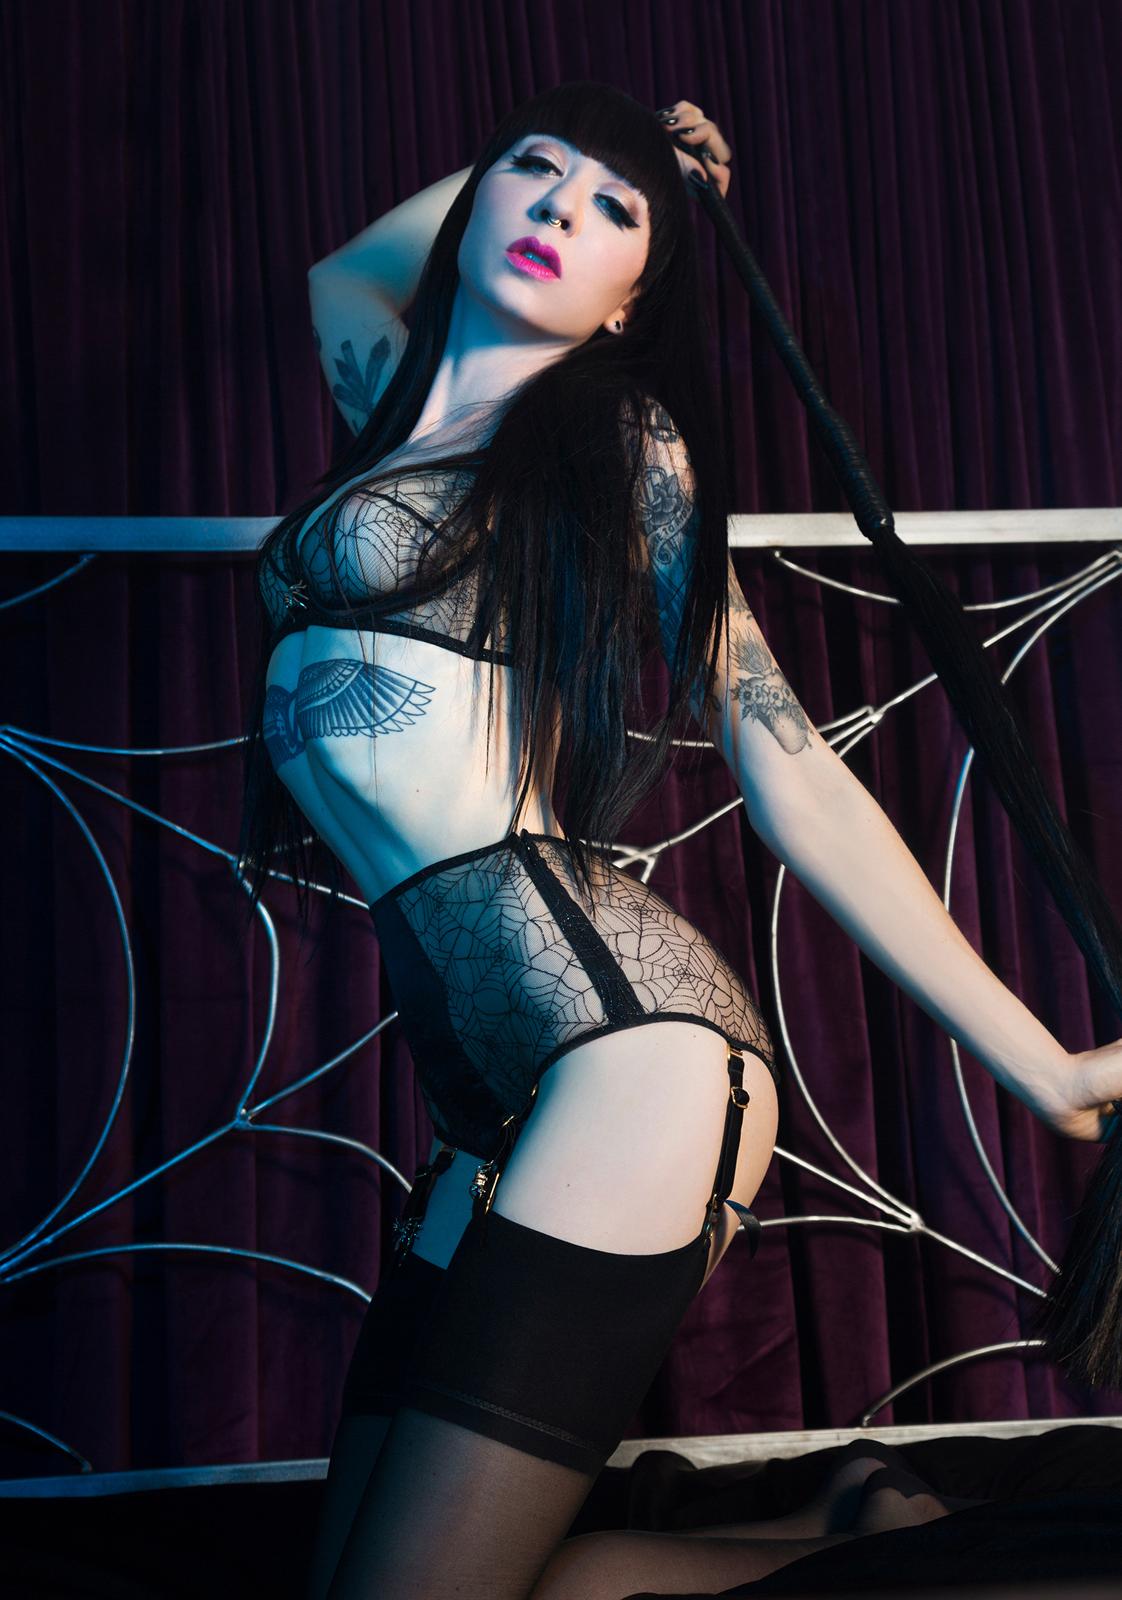 Mistress_Ramona_Ryder_Halloween_Pale_Goth_Punk_SF_NYC_Japan_6.jpg